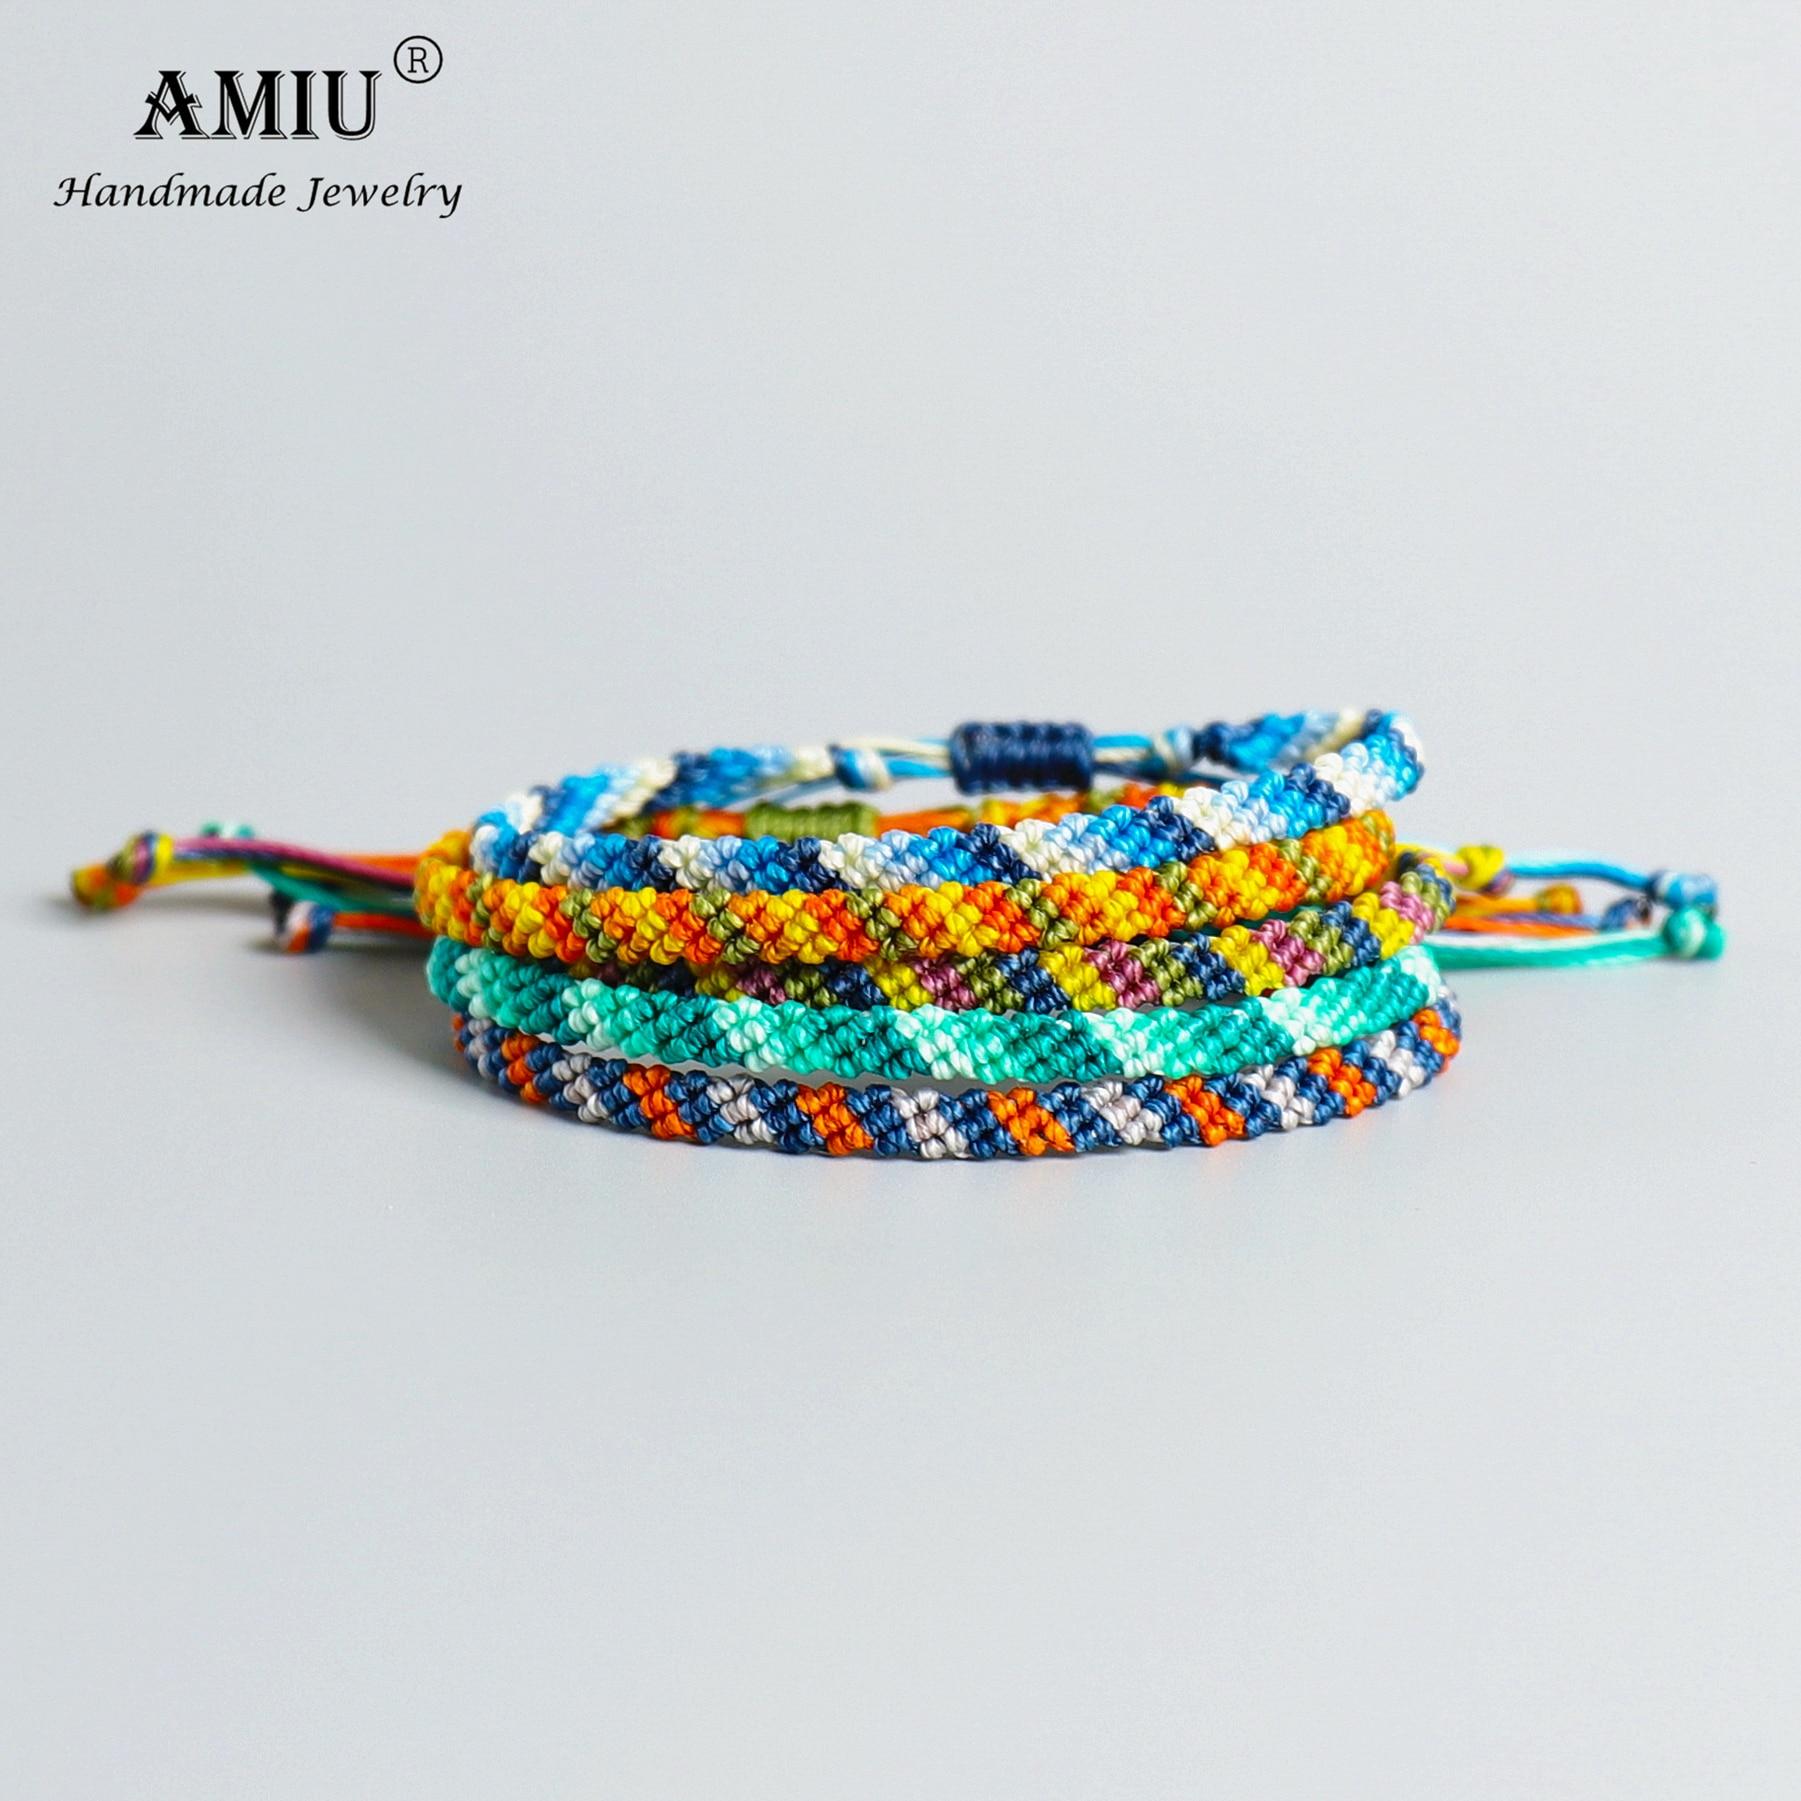 AMIU Handmade High Quality Waterproof Wax Thread Lucky Rope Bracelet & Bangles For Women Men Wax Thread Macrame Bracelets